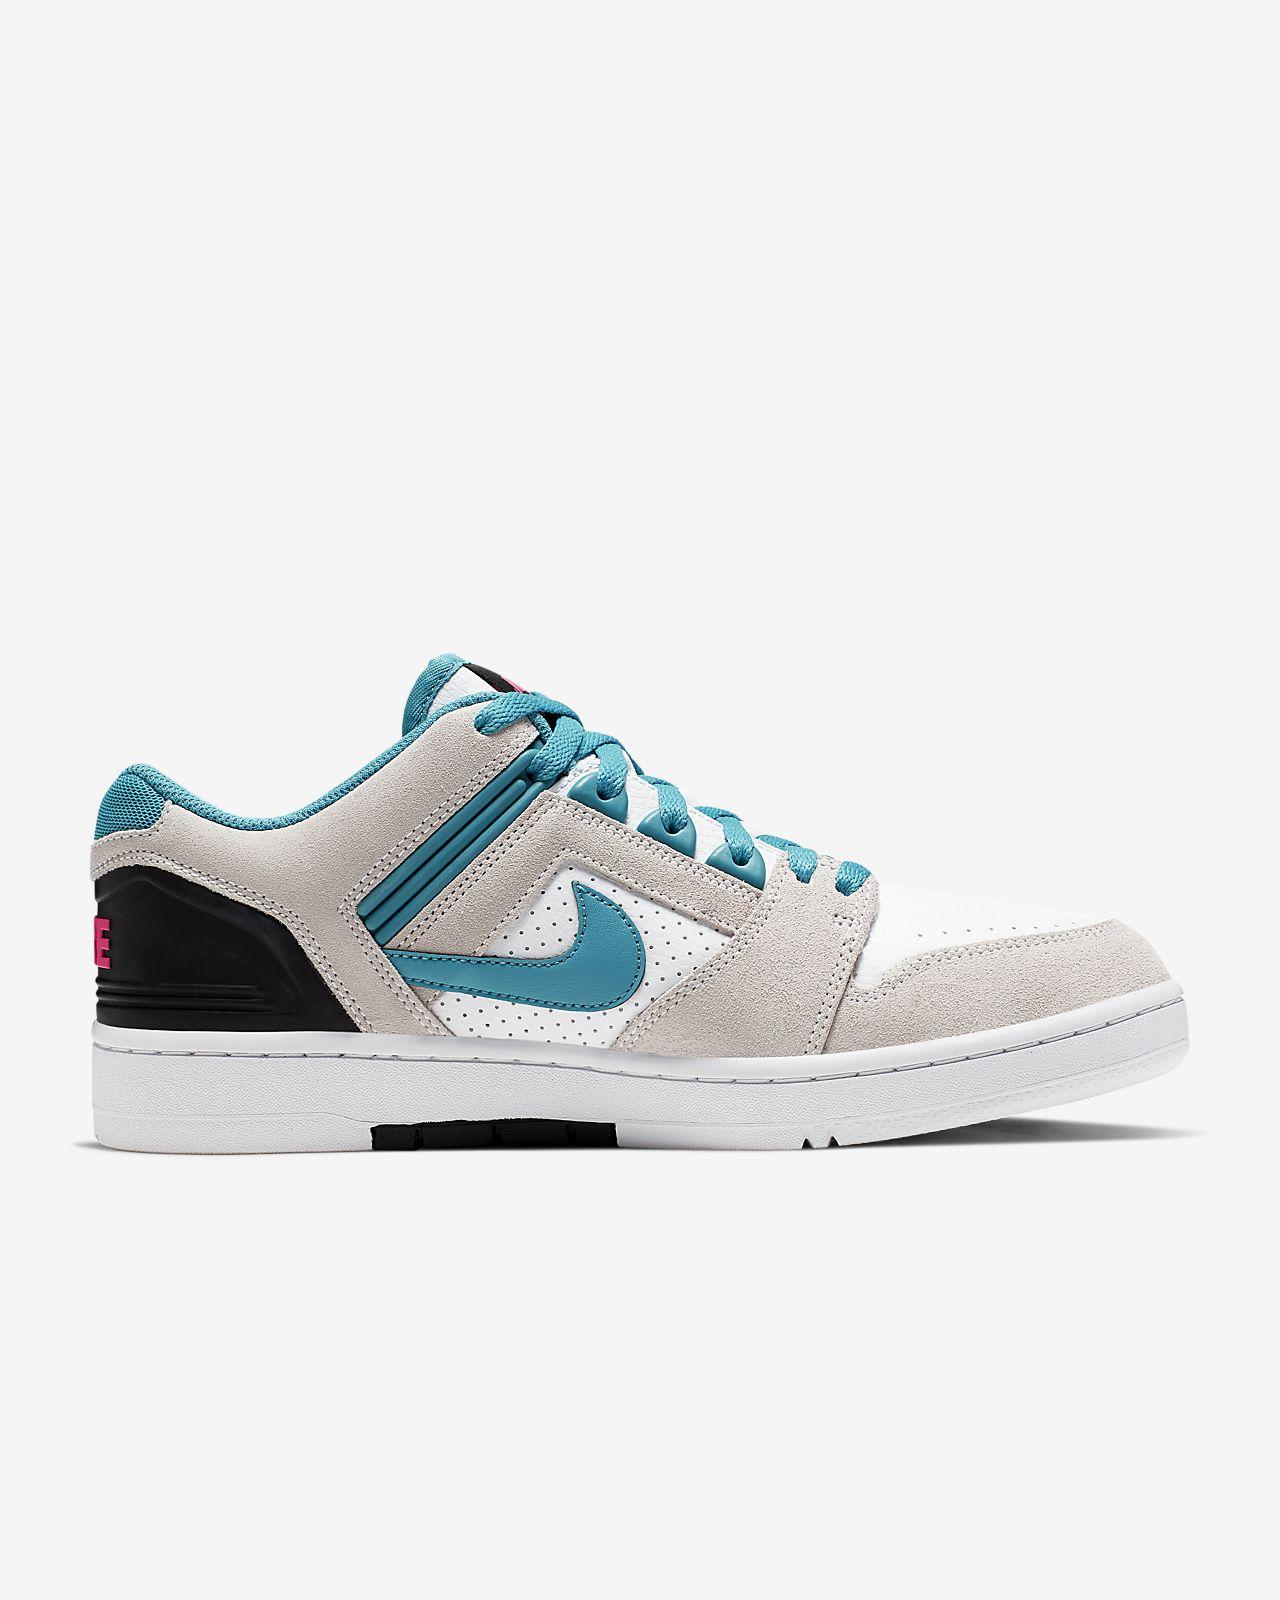 Air II skateboard Force Nike Chaussure de Low SB Homme pour rCWoeQdxB